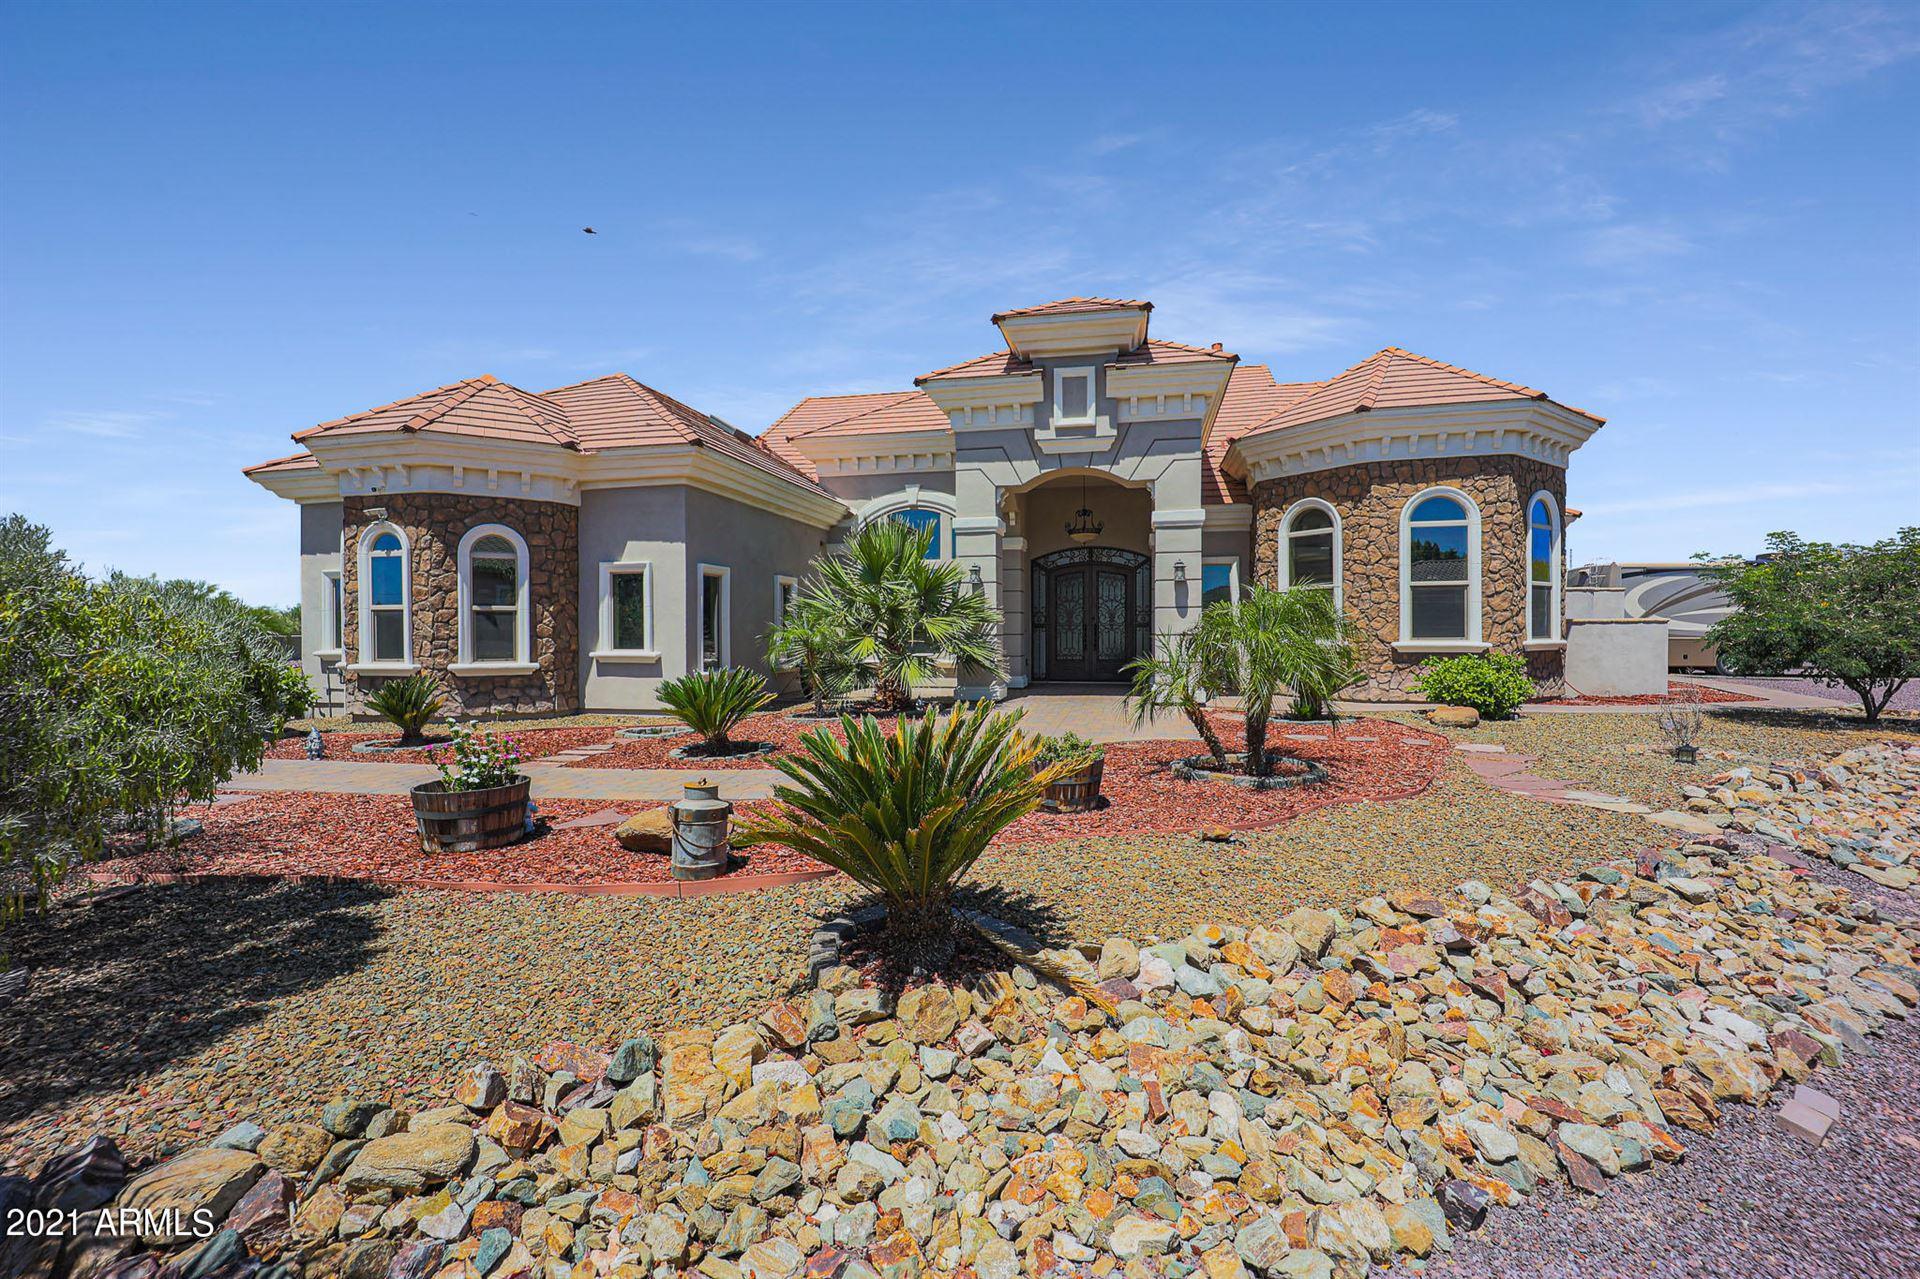 7050 W VILLA LINDO Drive, Peoria, AZ 85383 - #: 6113579